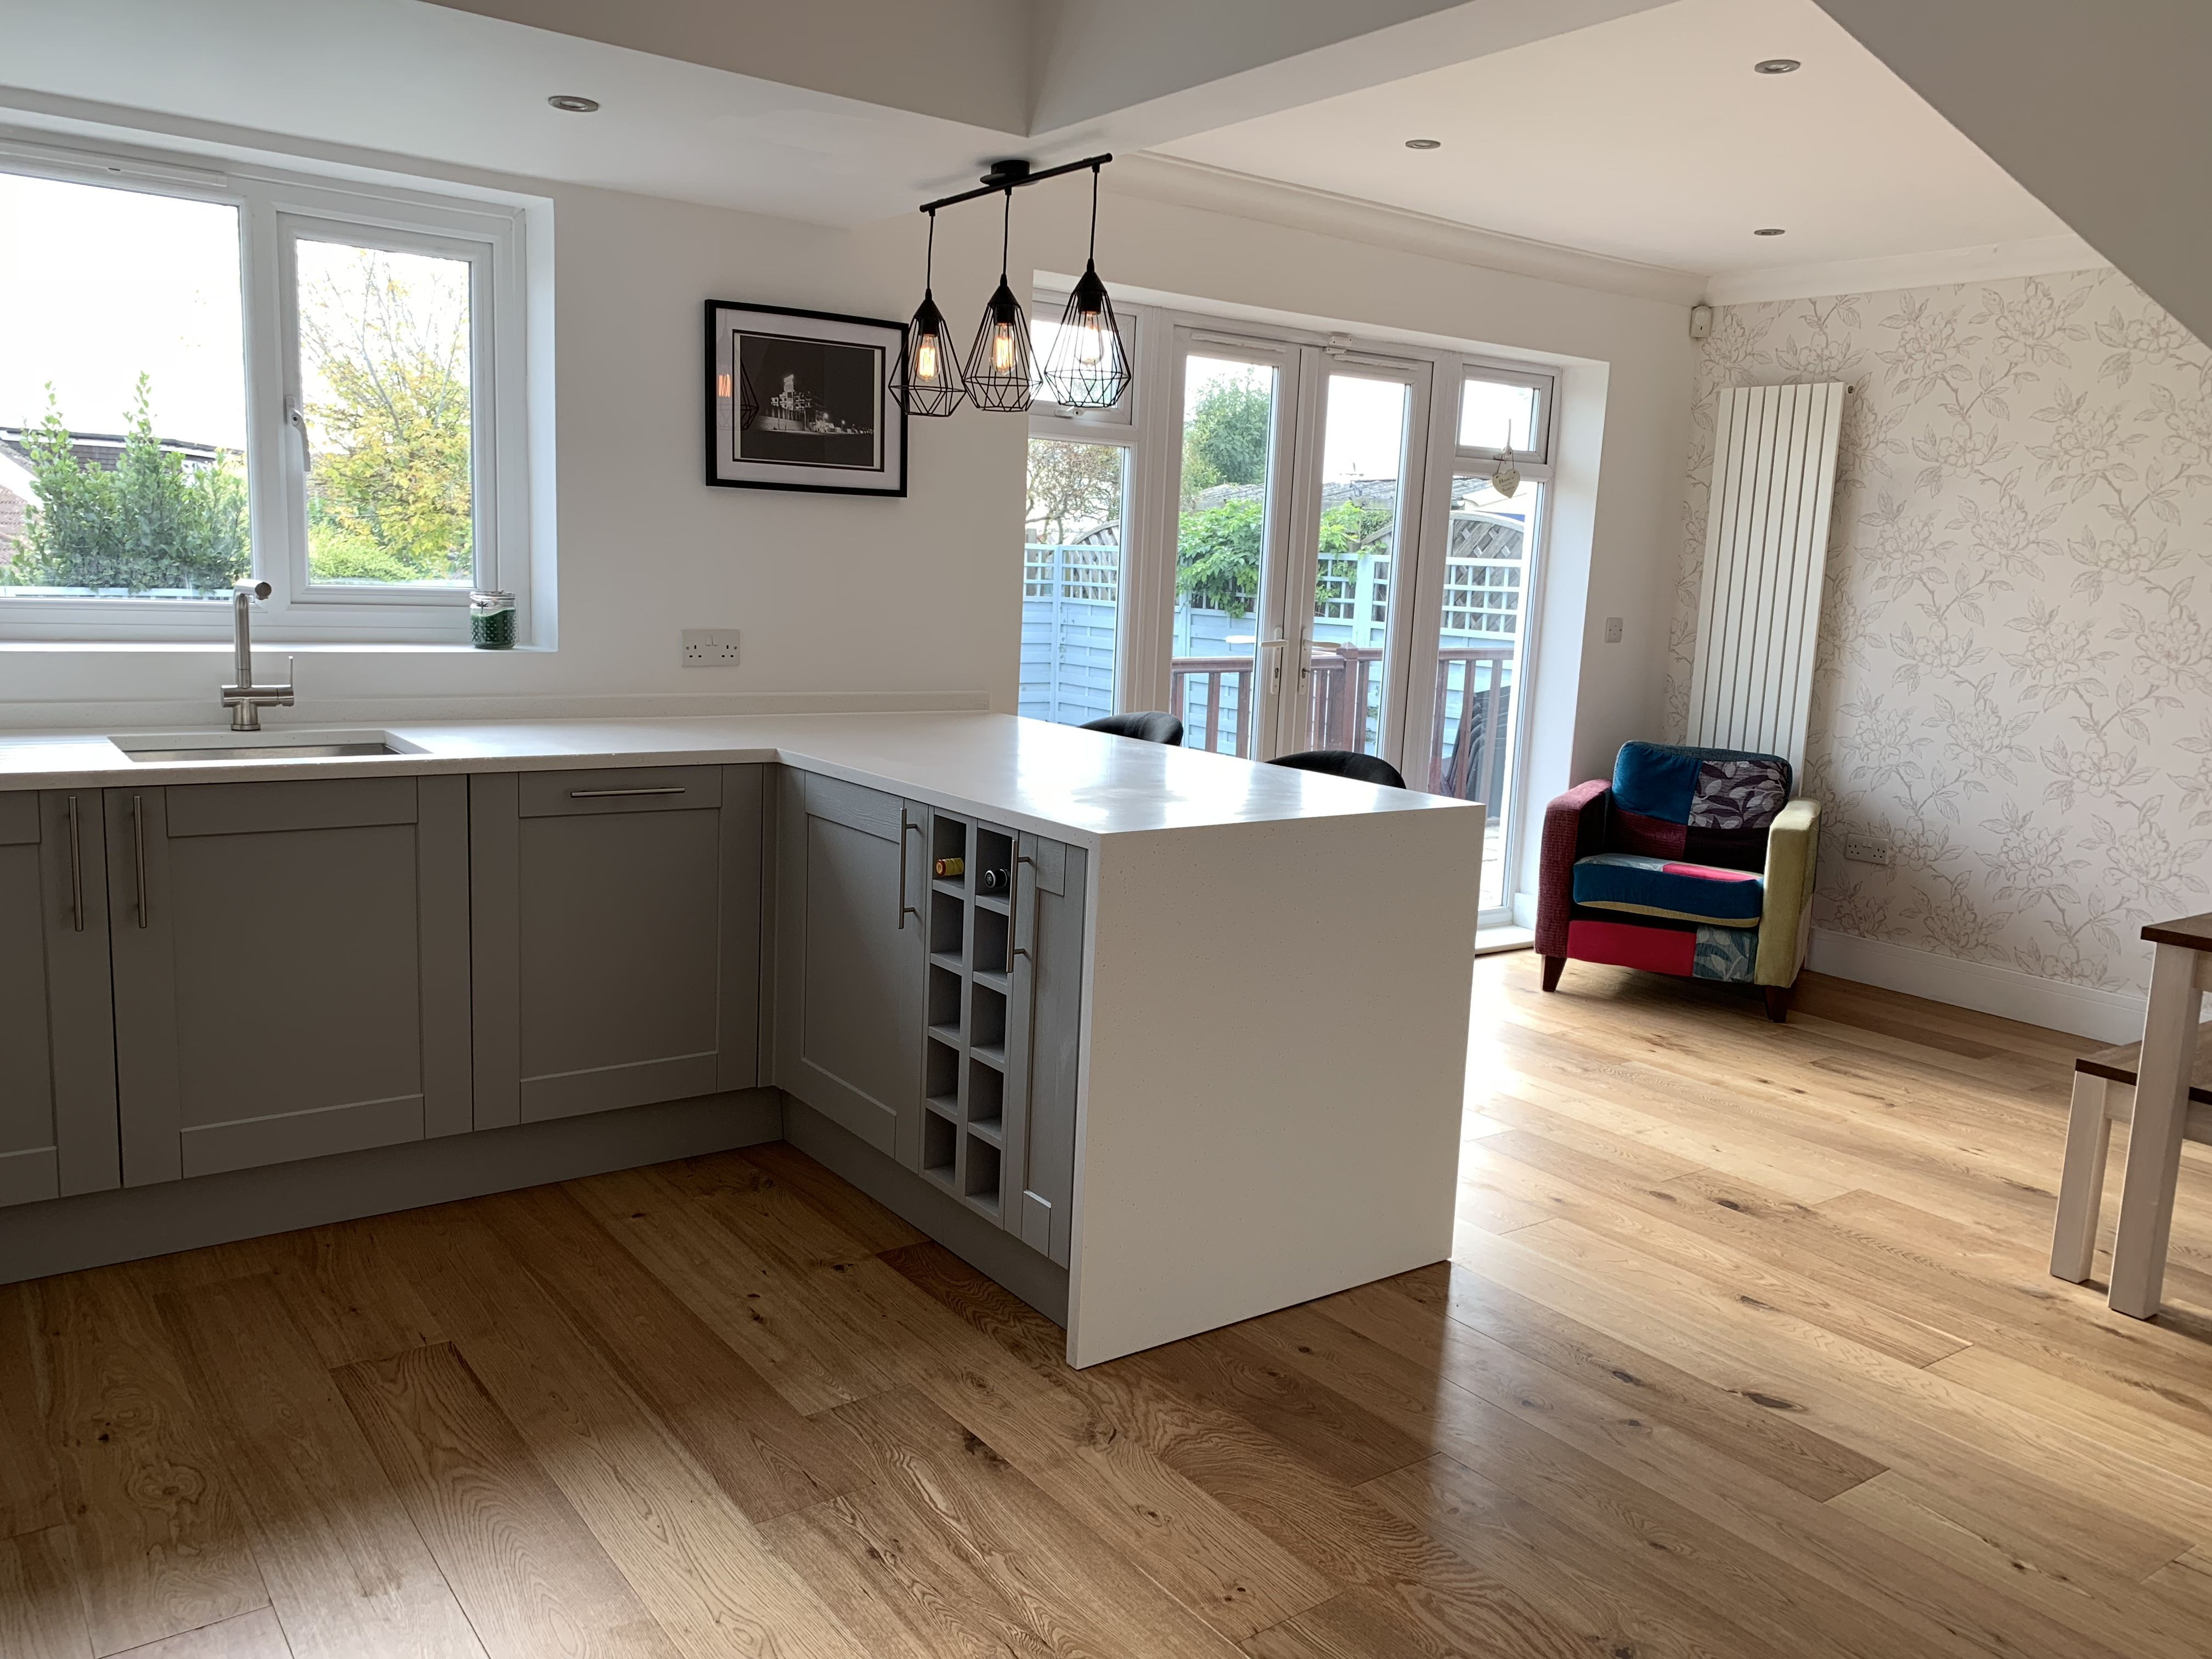 Howdens fairford kitchen, Apollo Slab Tech worktops. Howdens ...